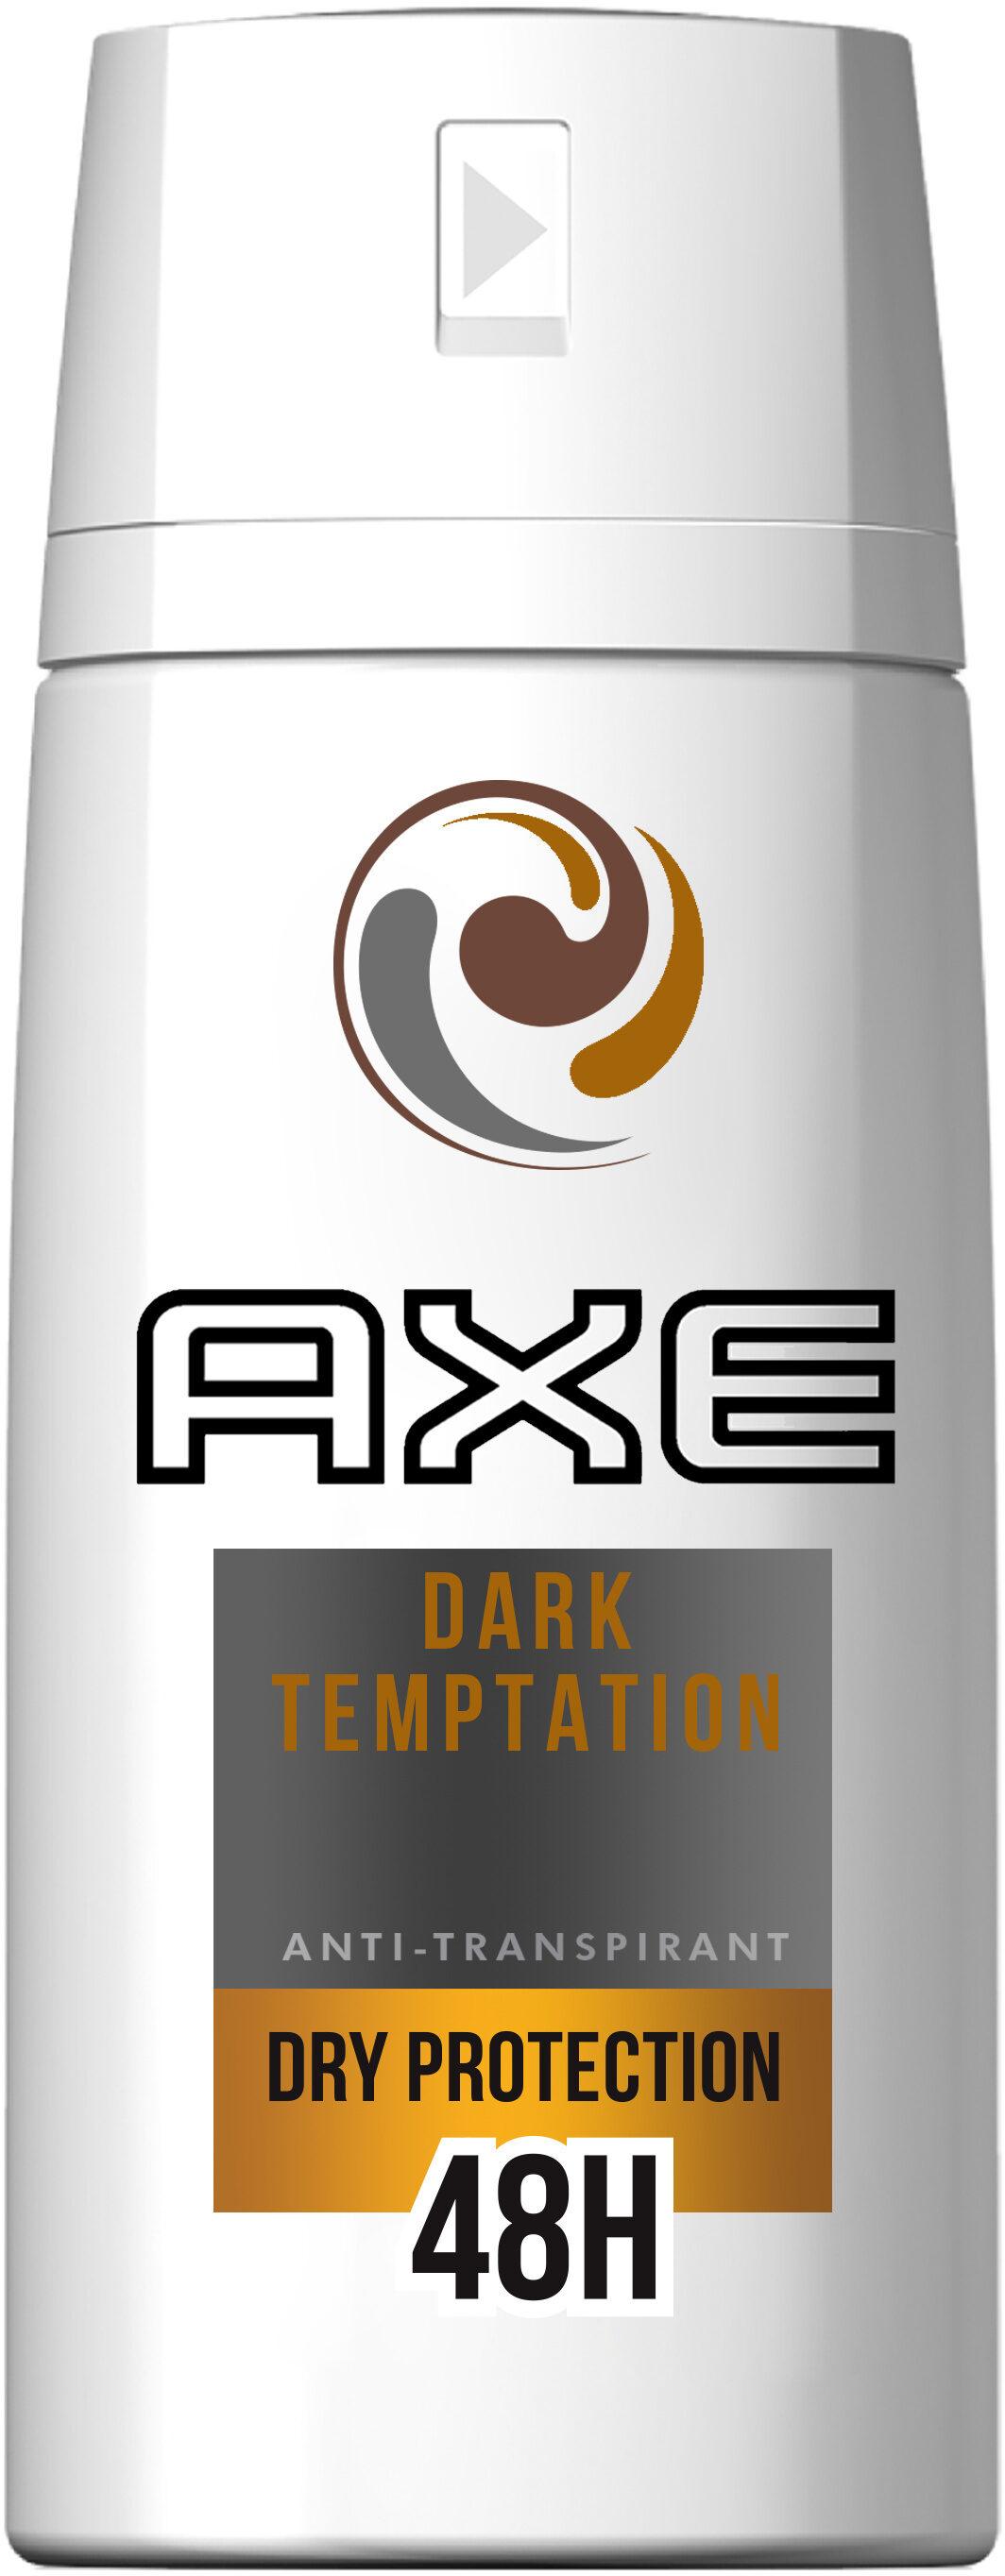 AXE Déodorant Homme Spray Antibactérien Dark Temptation - Product - fr